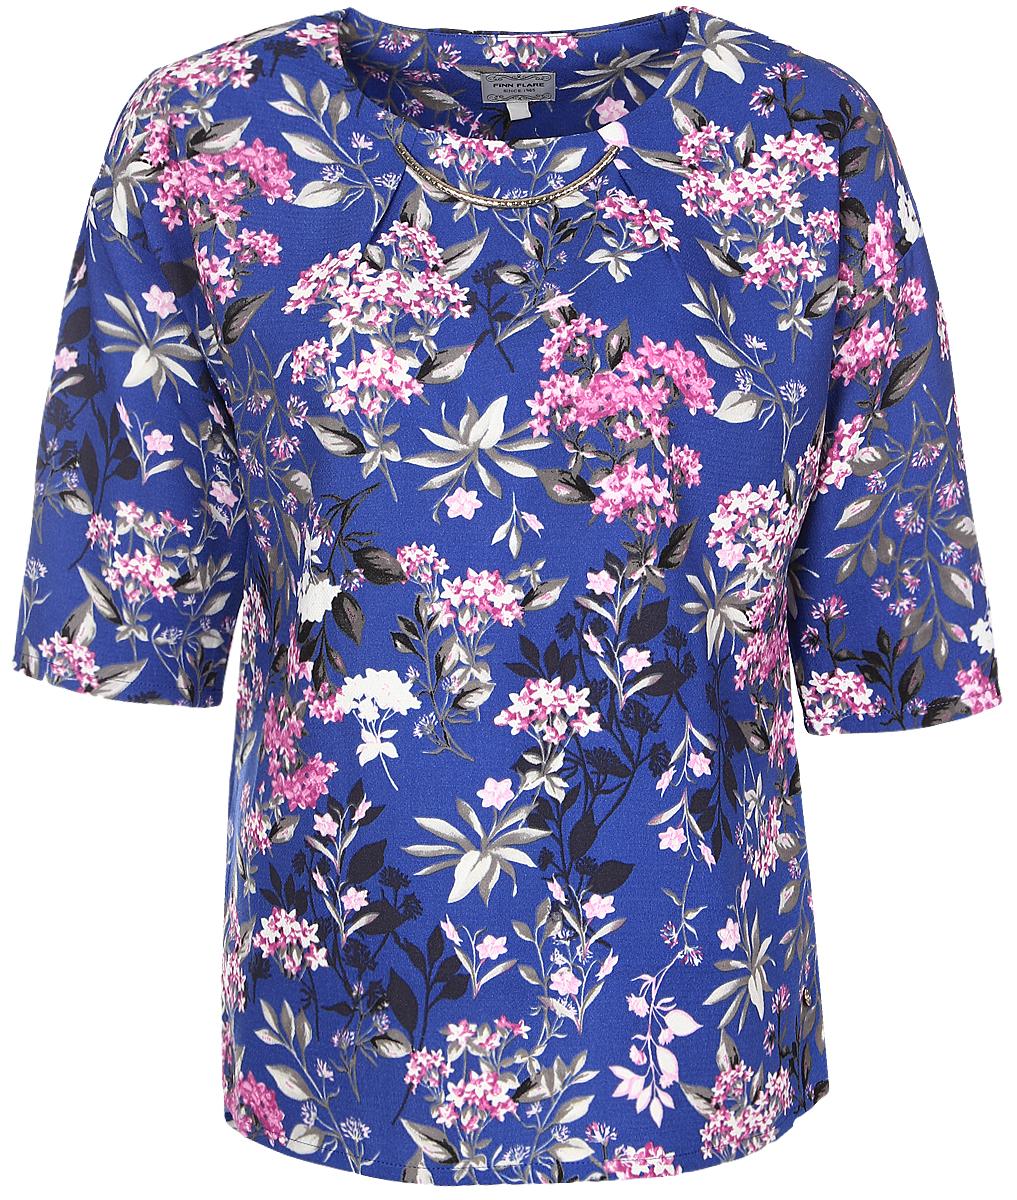 Блузка женская Finn Flare, цвет: синий. B17-11075_103. Размер M (46) цена 2017